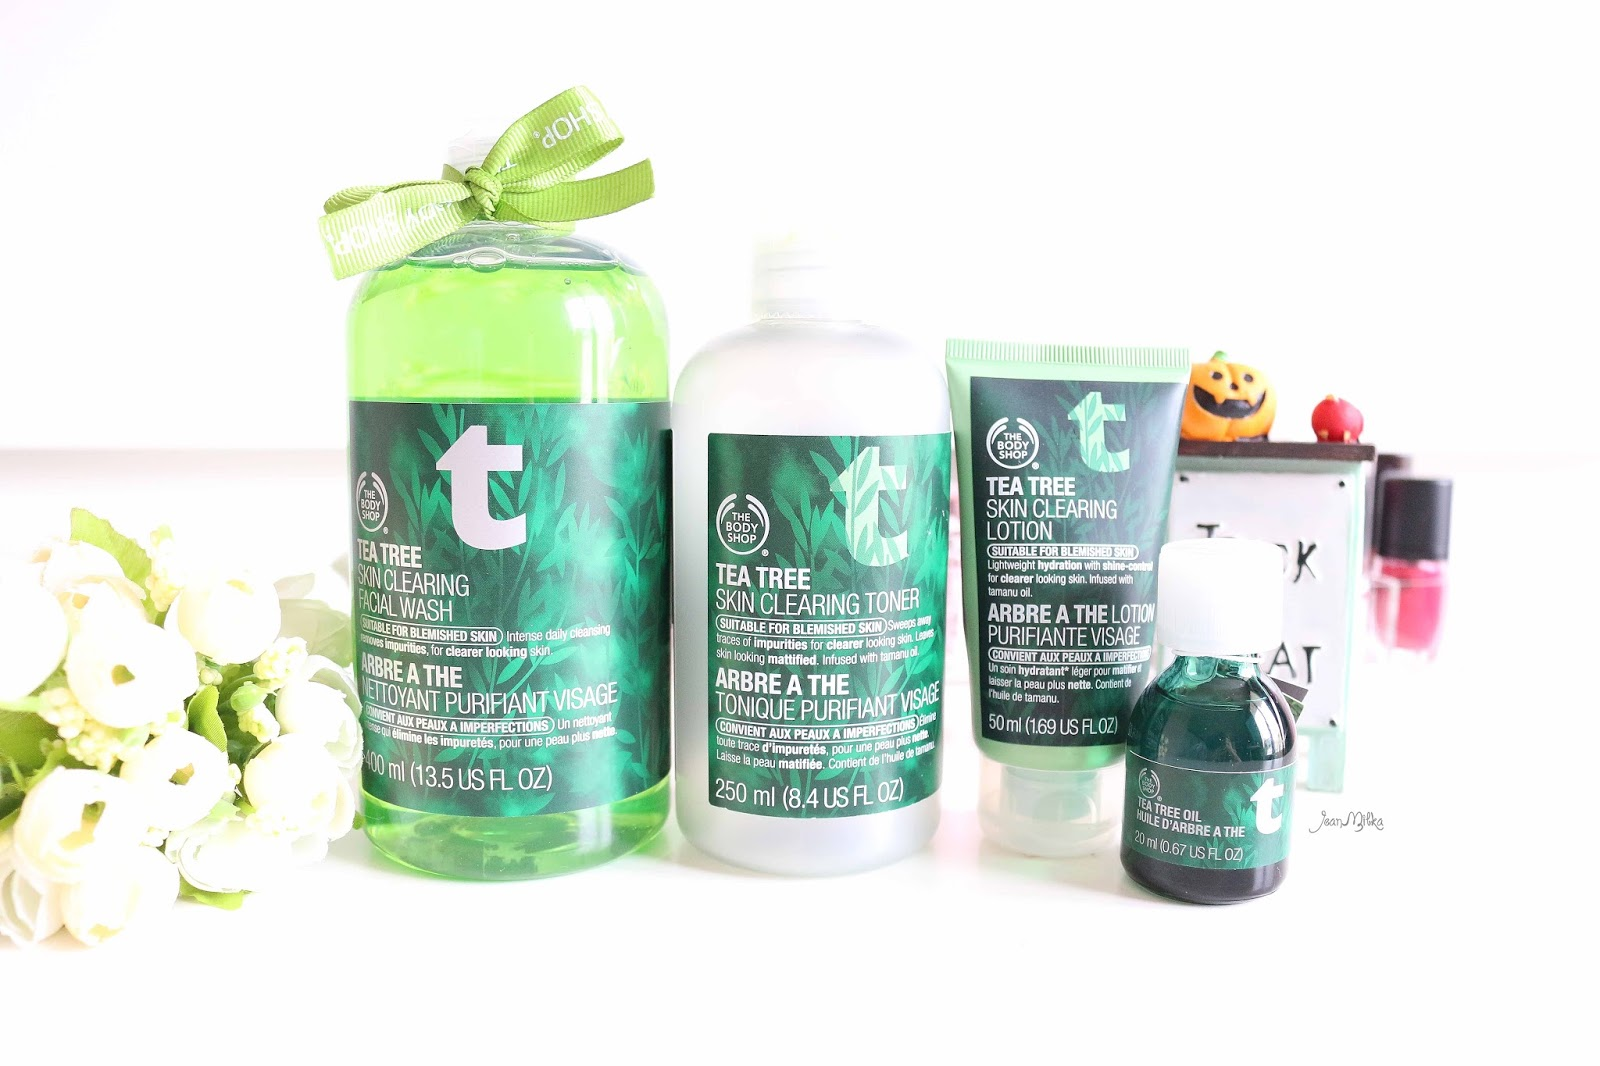 the body shop, body shop, body shop tea tree, tea tree, jerawat, acne, oily skin, skin care, beauty blog